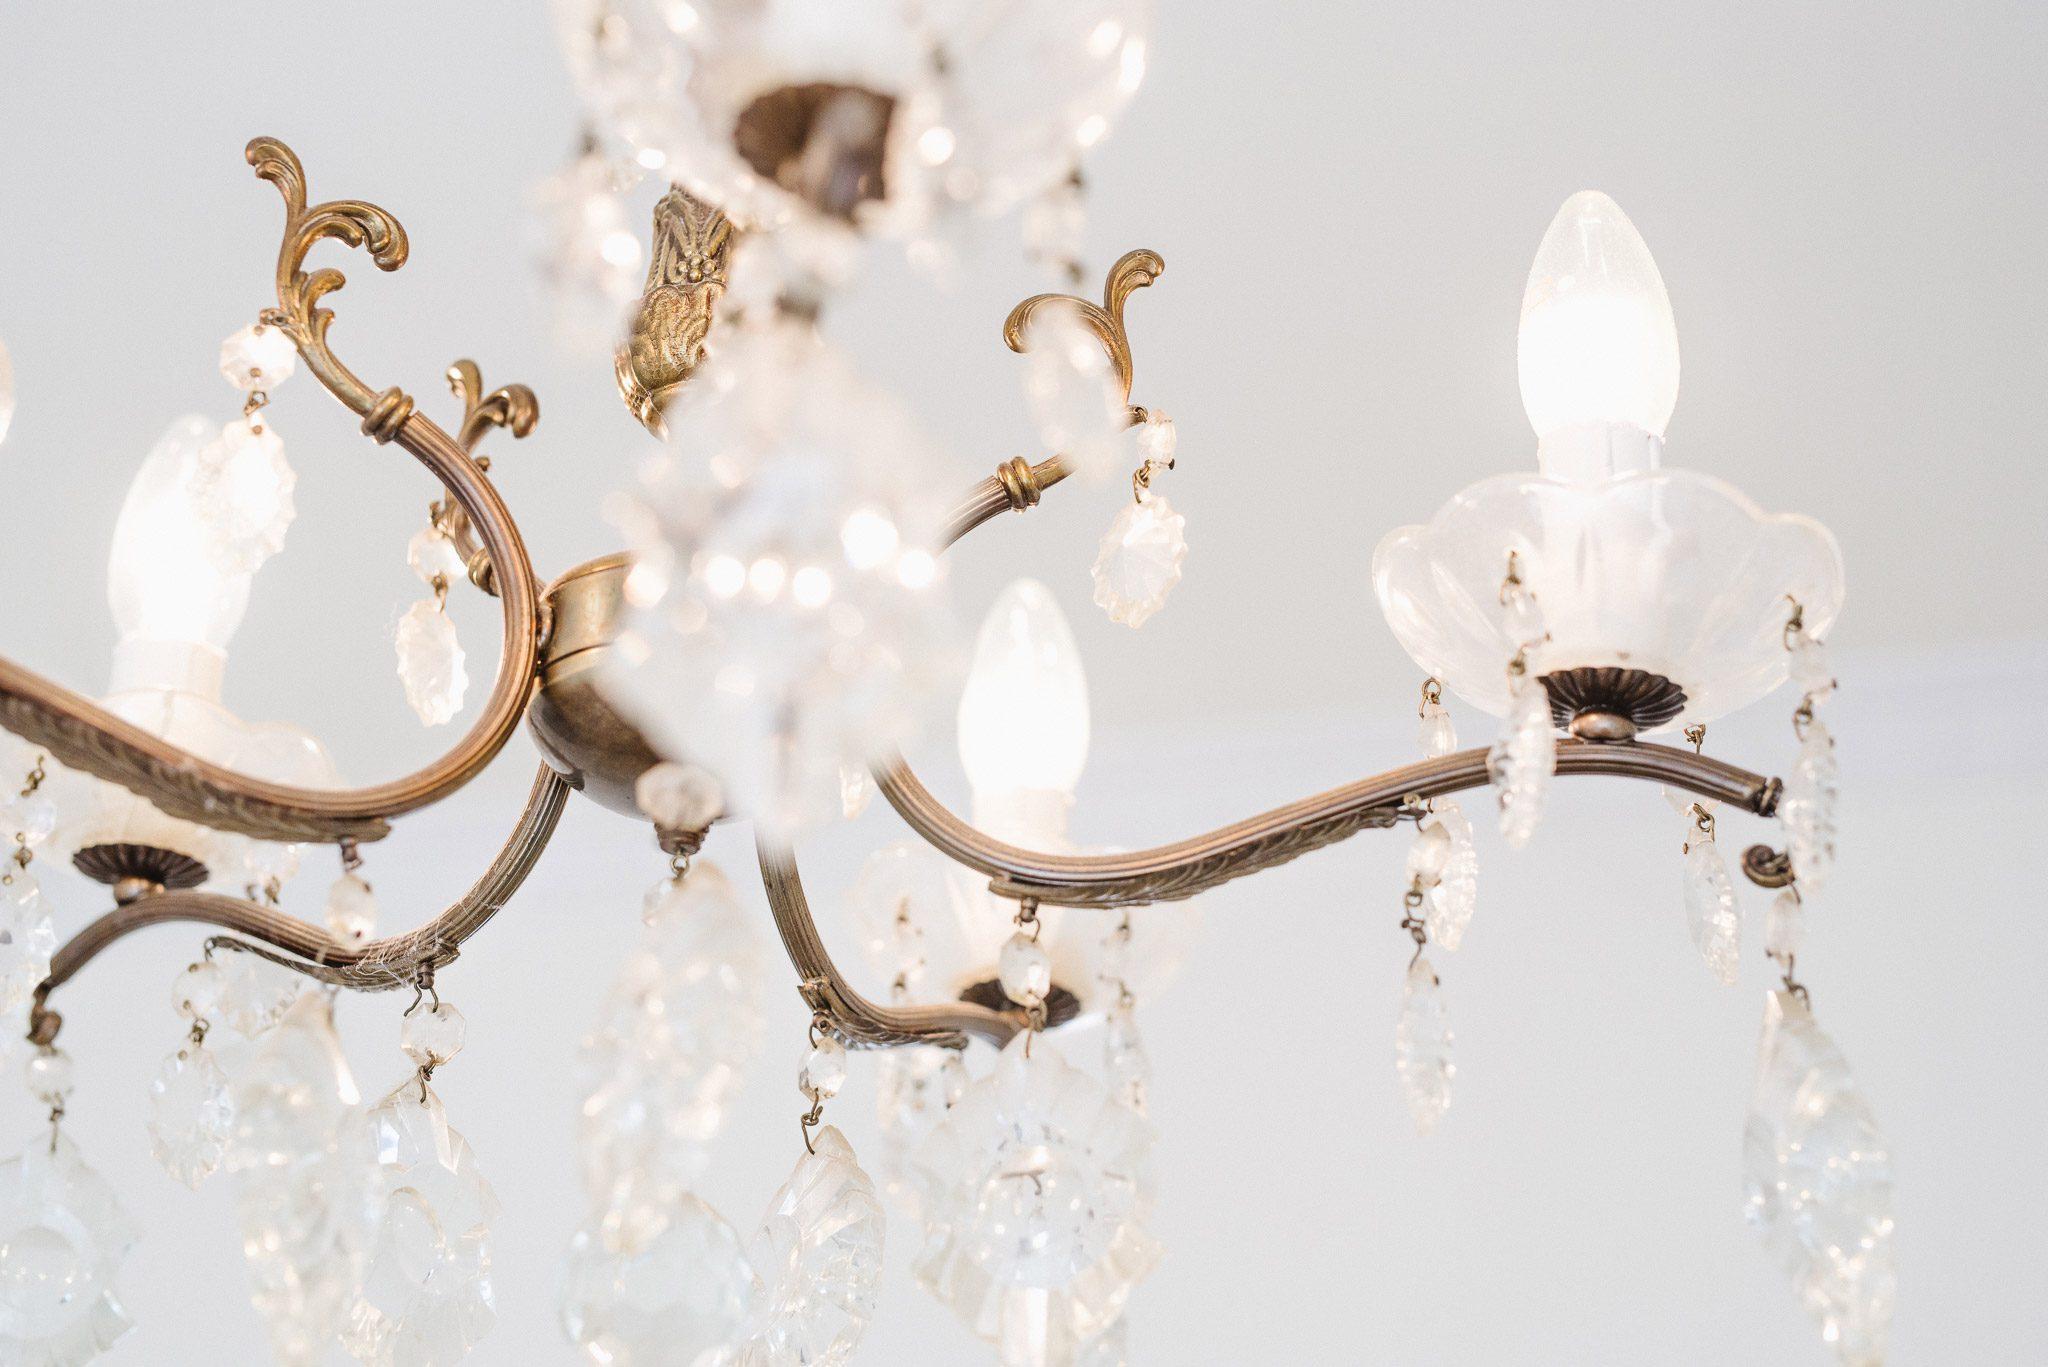 chandelier from the boudoir studio